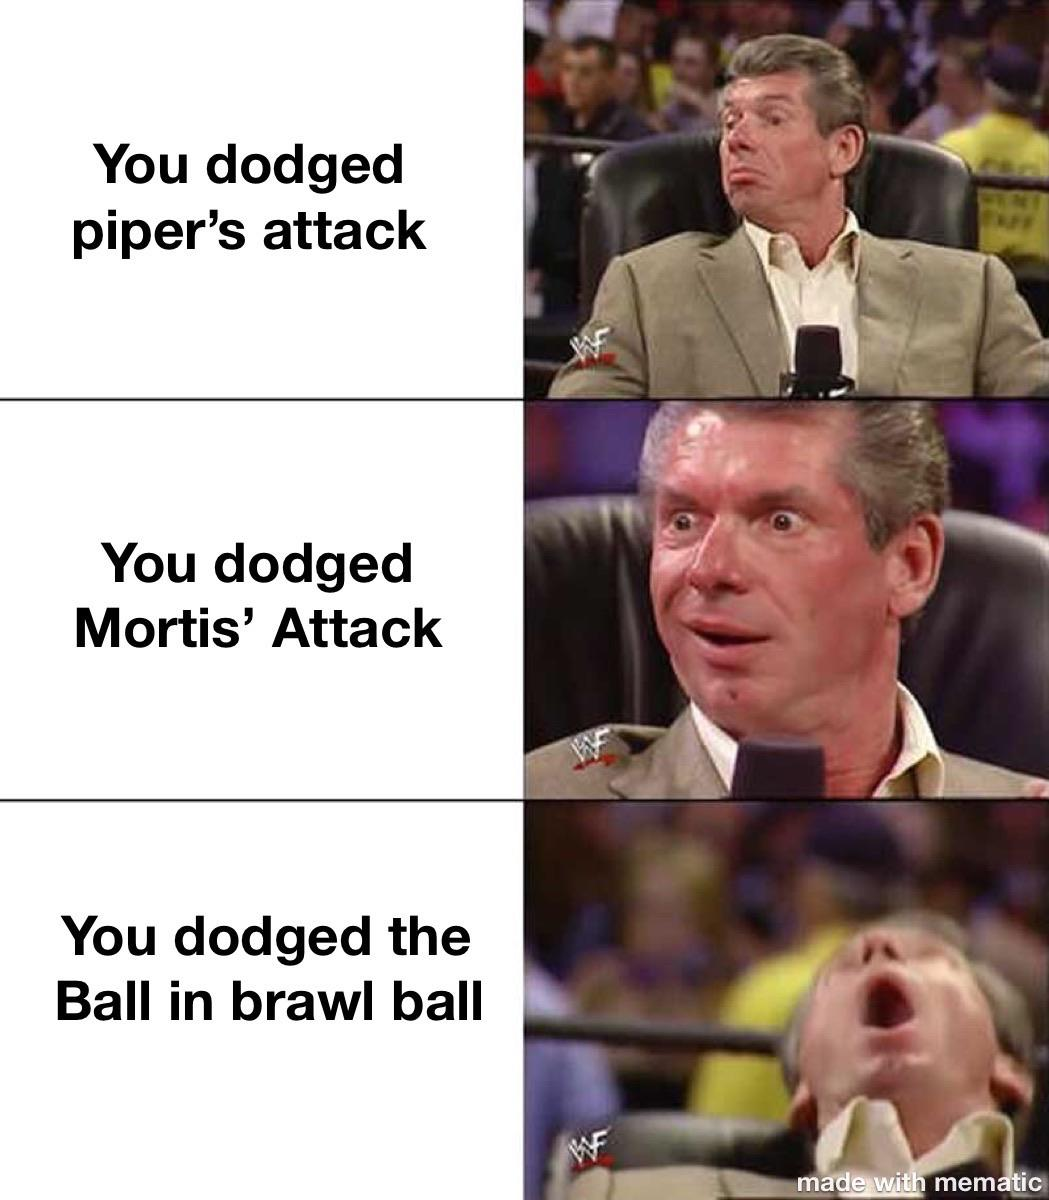 High Iq Meme Pewdiepiesubmissions